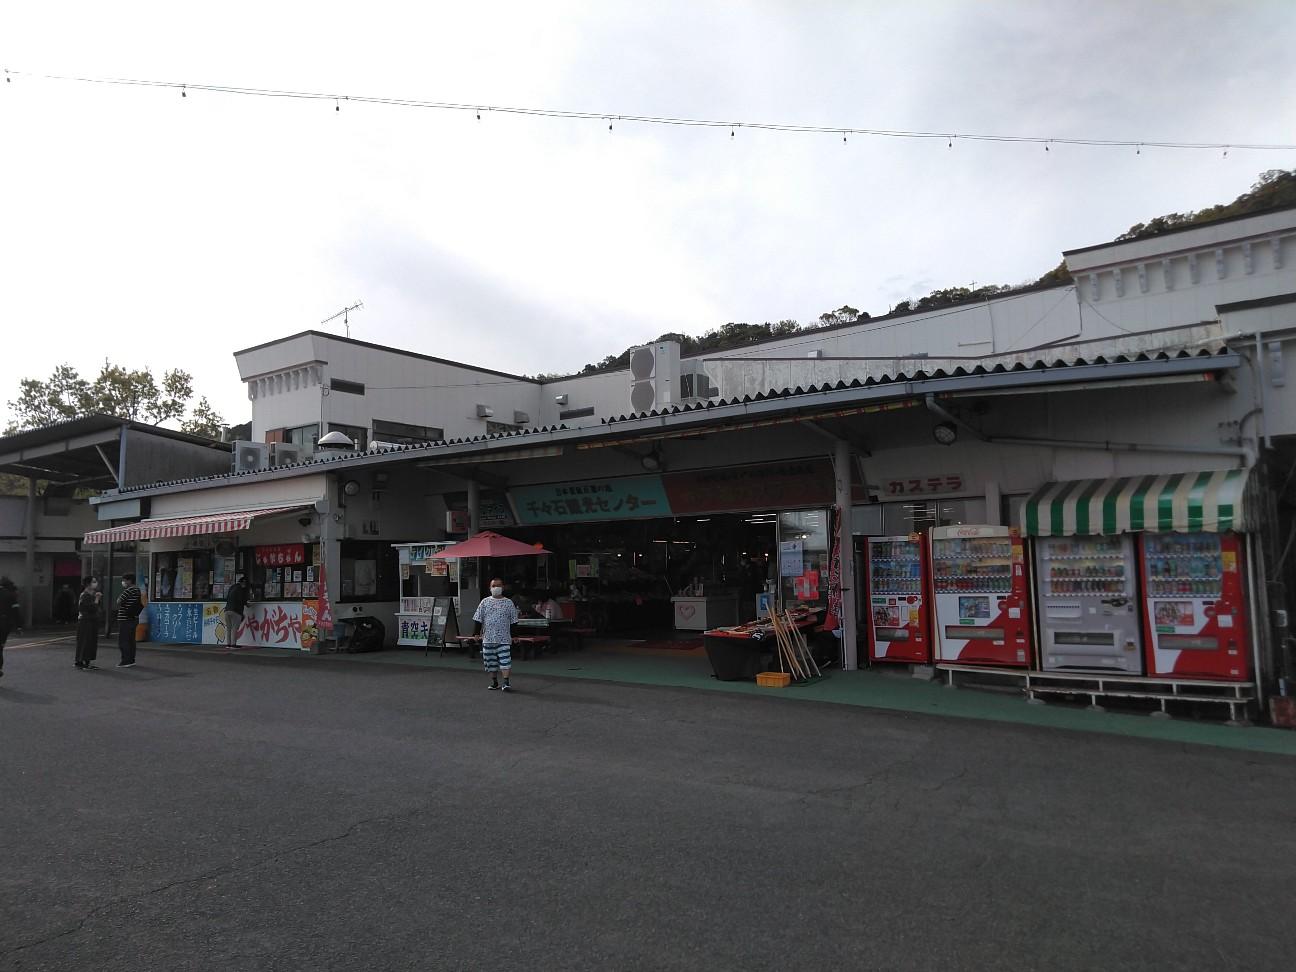 f:id:nagacchan:20210329210932j:image